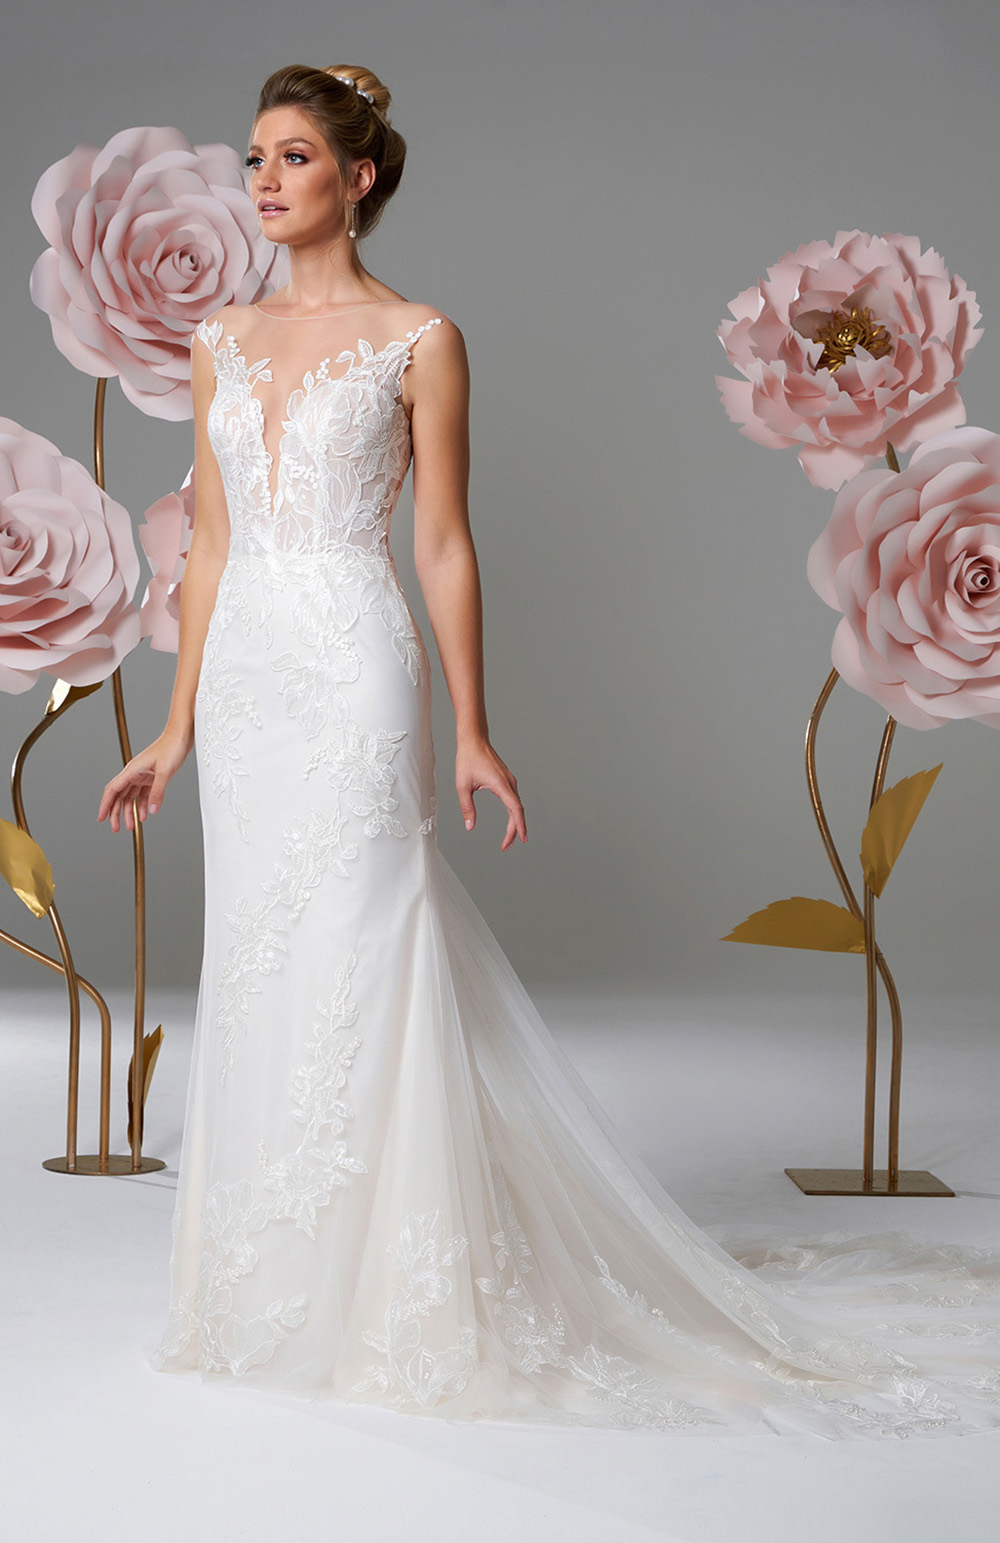 Robe de mariée Modèle Itzel